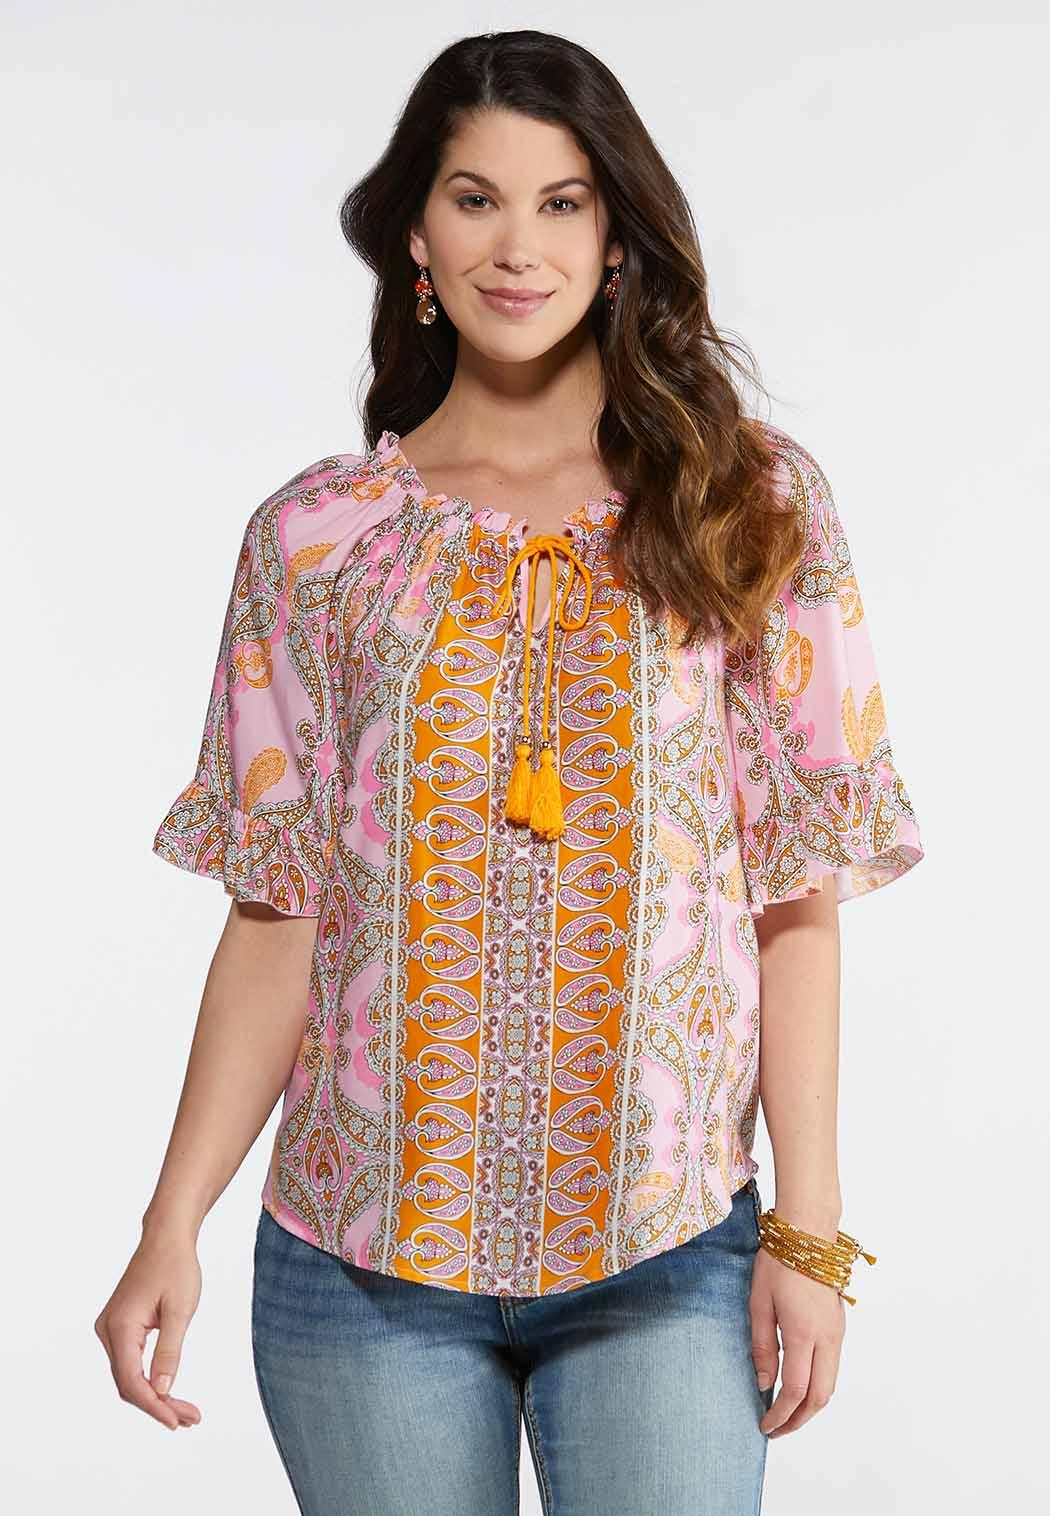 d3f593806c69d Paisley Tasseled Poet Top Shirts   Blouses Cato Fashions